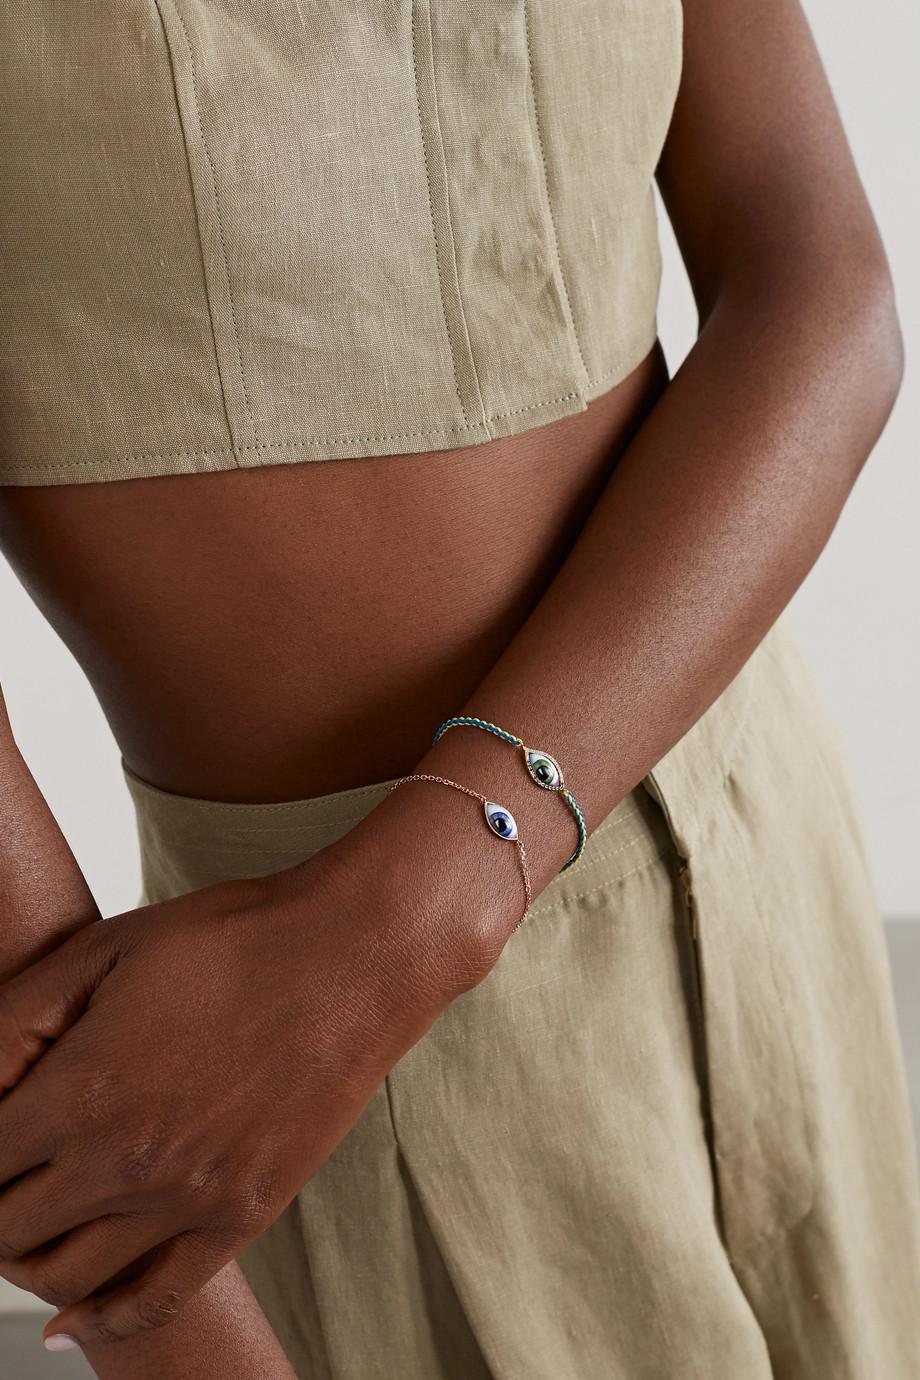 Lito Petit Vert 14-karat gold and macramé multi-stone bracelet